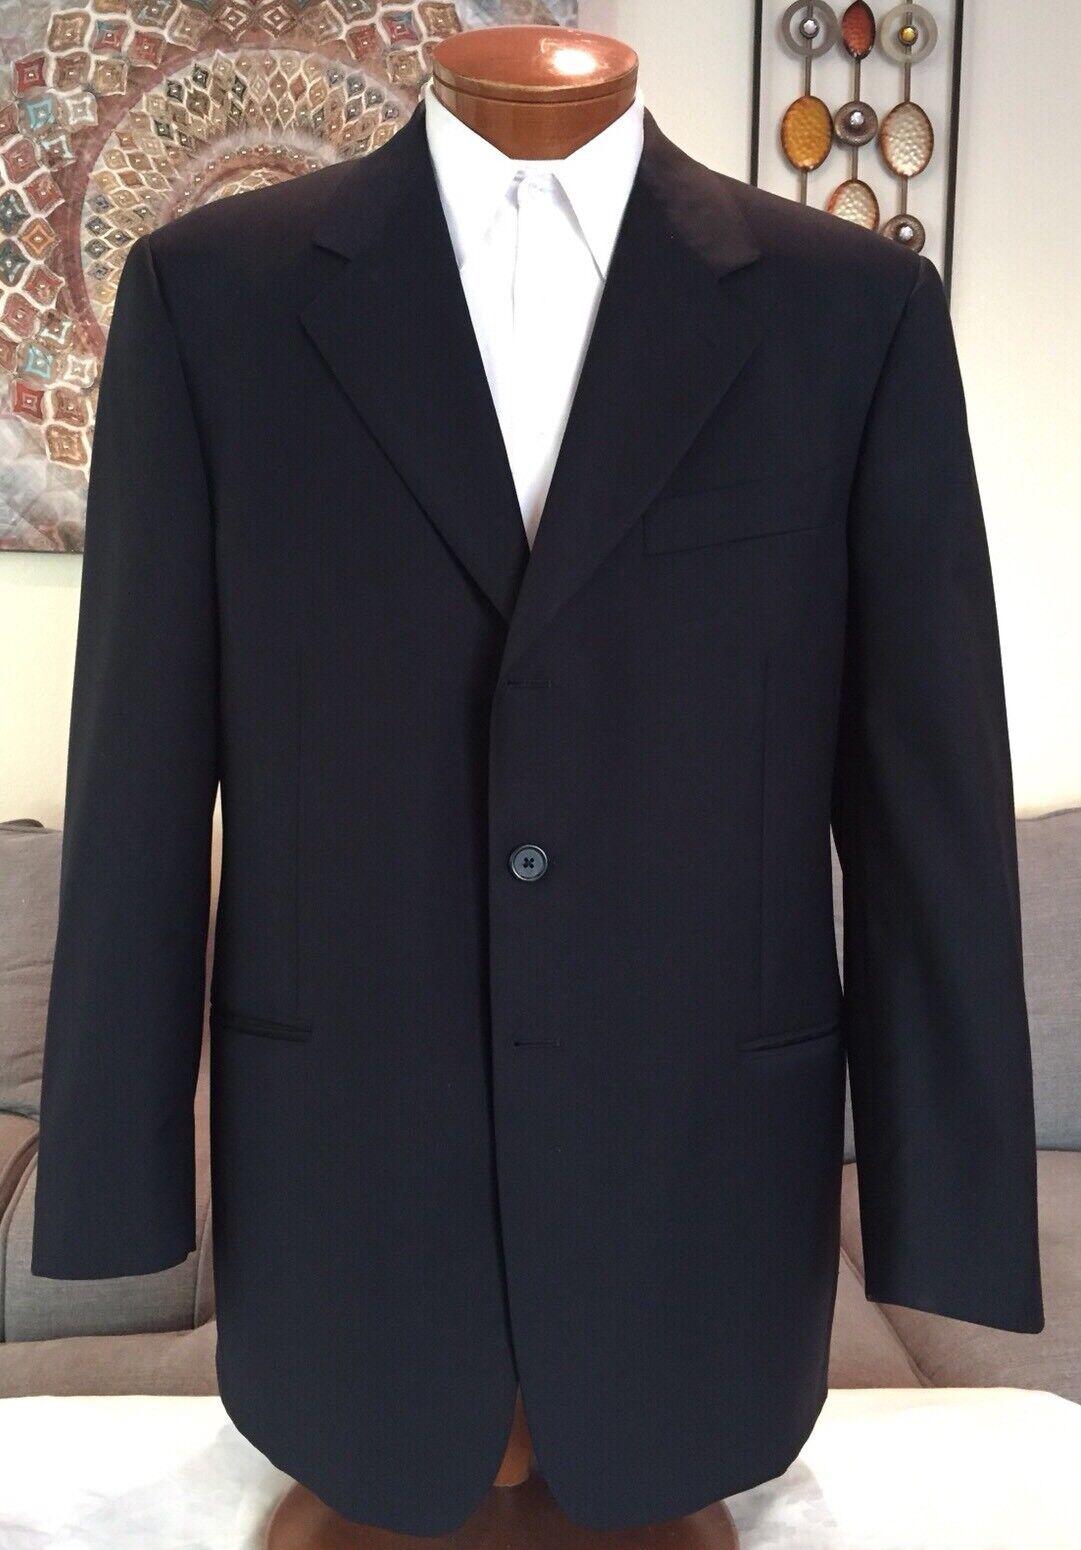 Stunning Gianfranco Ferre  Herren Blau Dual Vent 3 Btn Suit Sz 44 R MINT